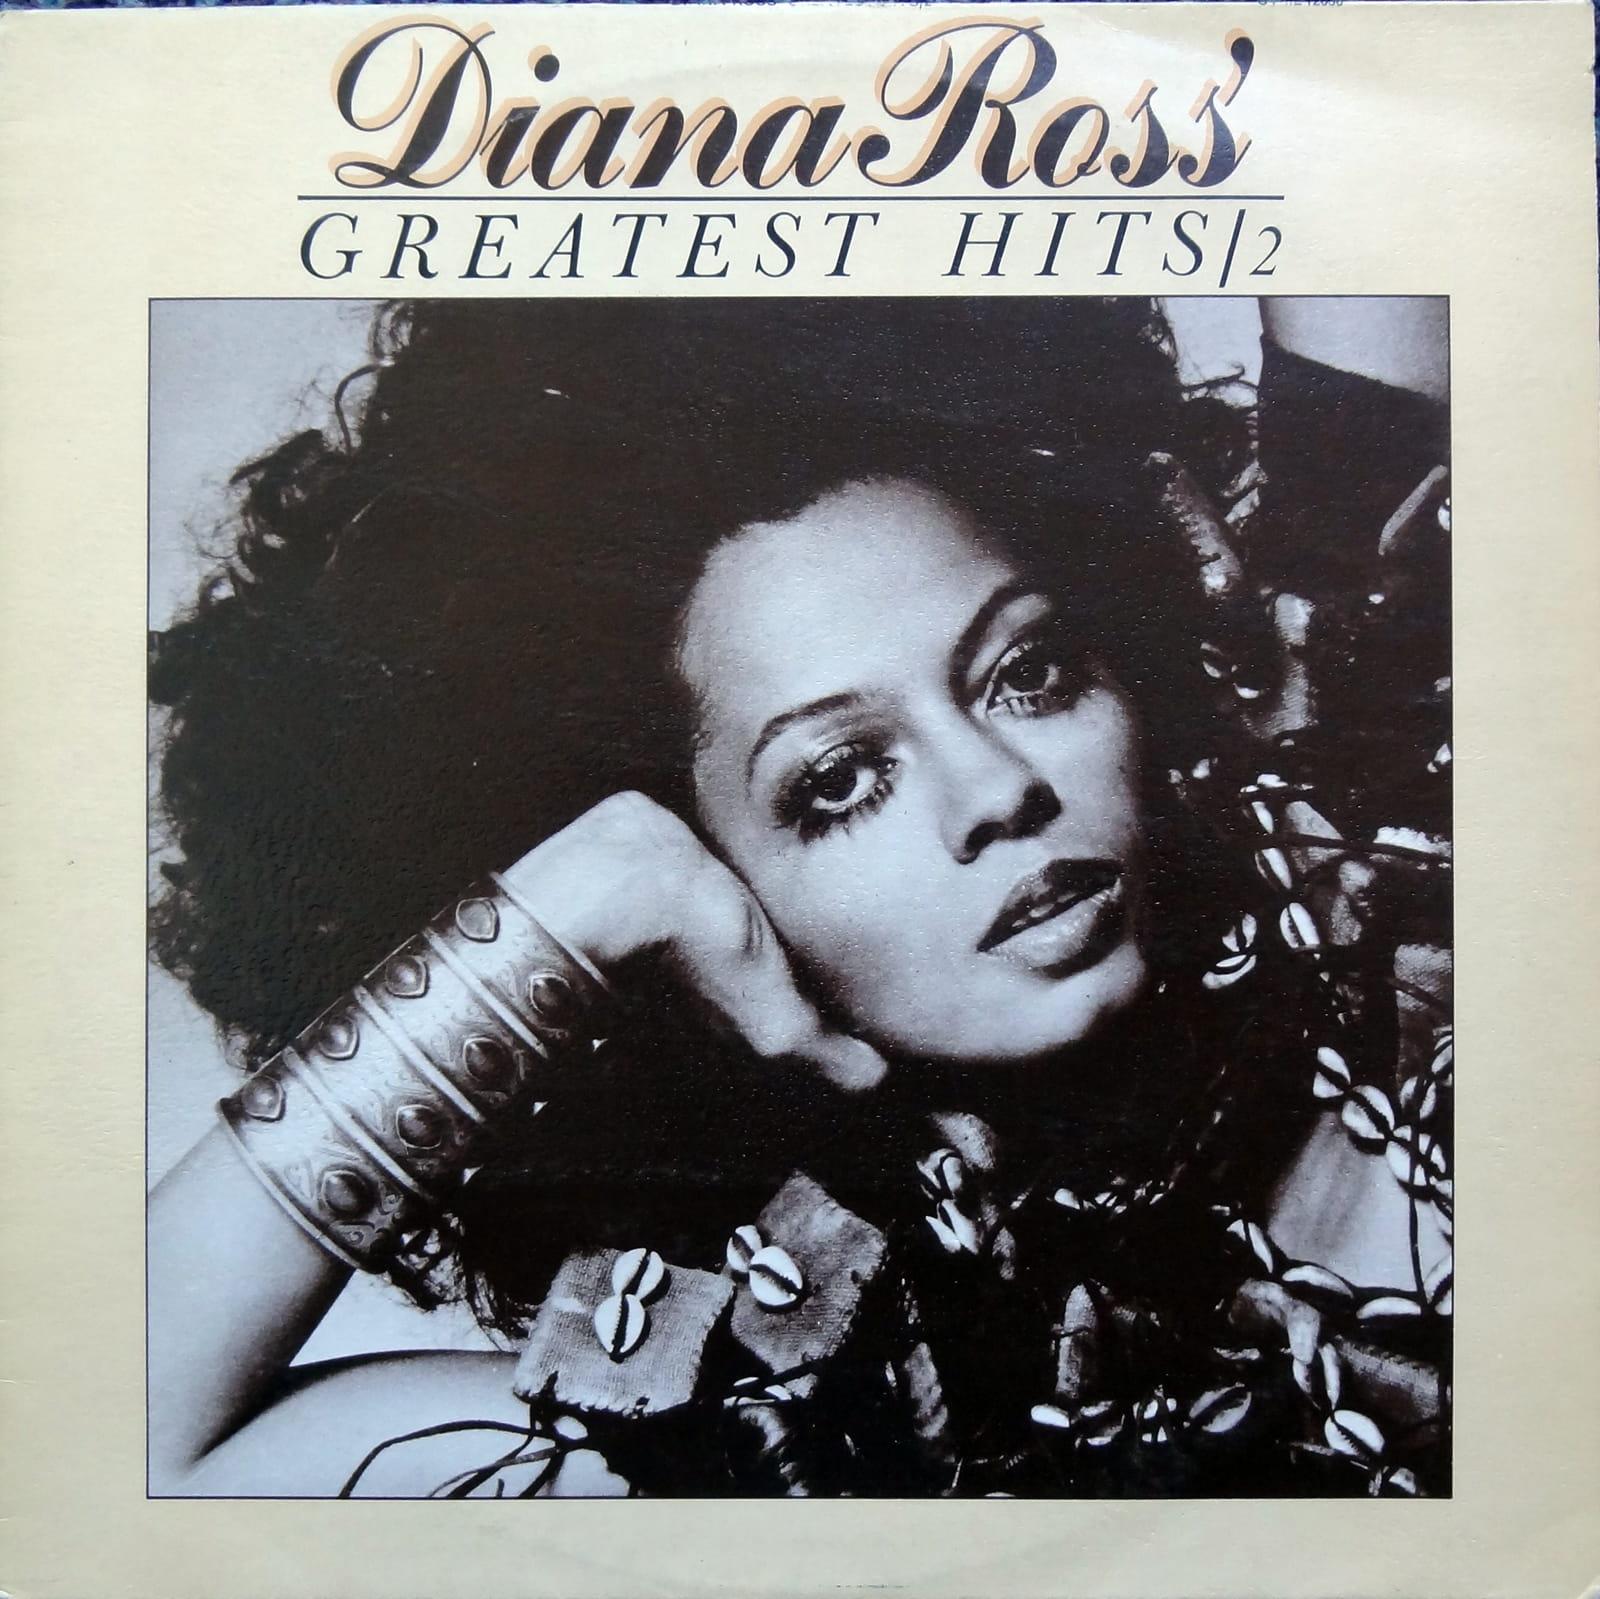 Diana Ross Greatest Hits 2 Stml 12036 A1 B2 Vinyl Winyl 唱片